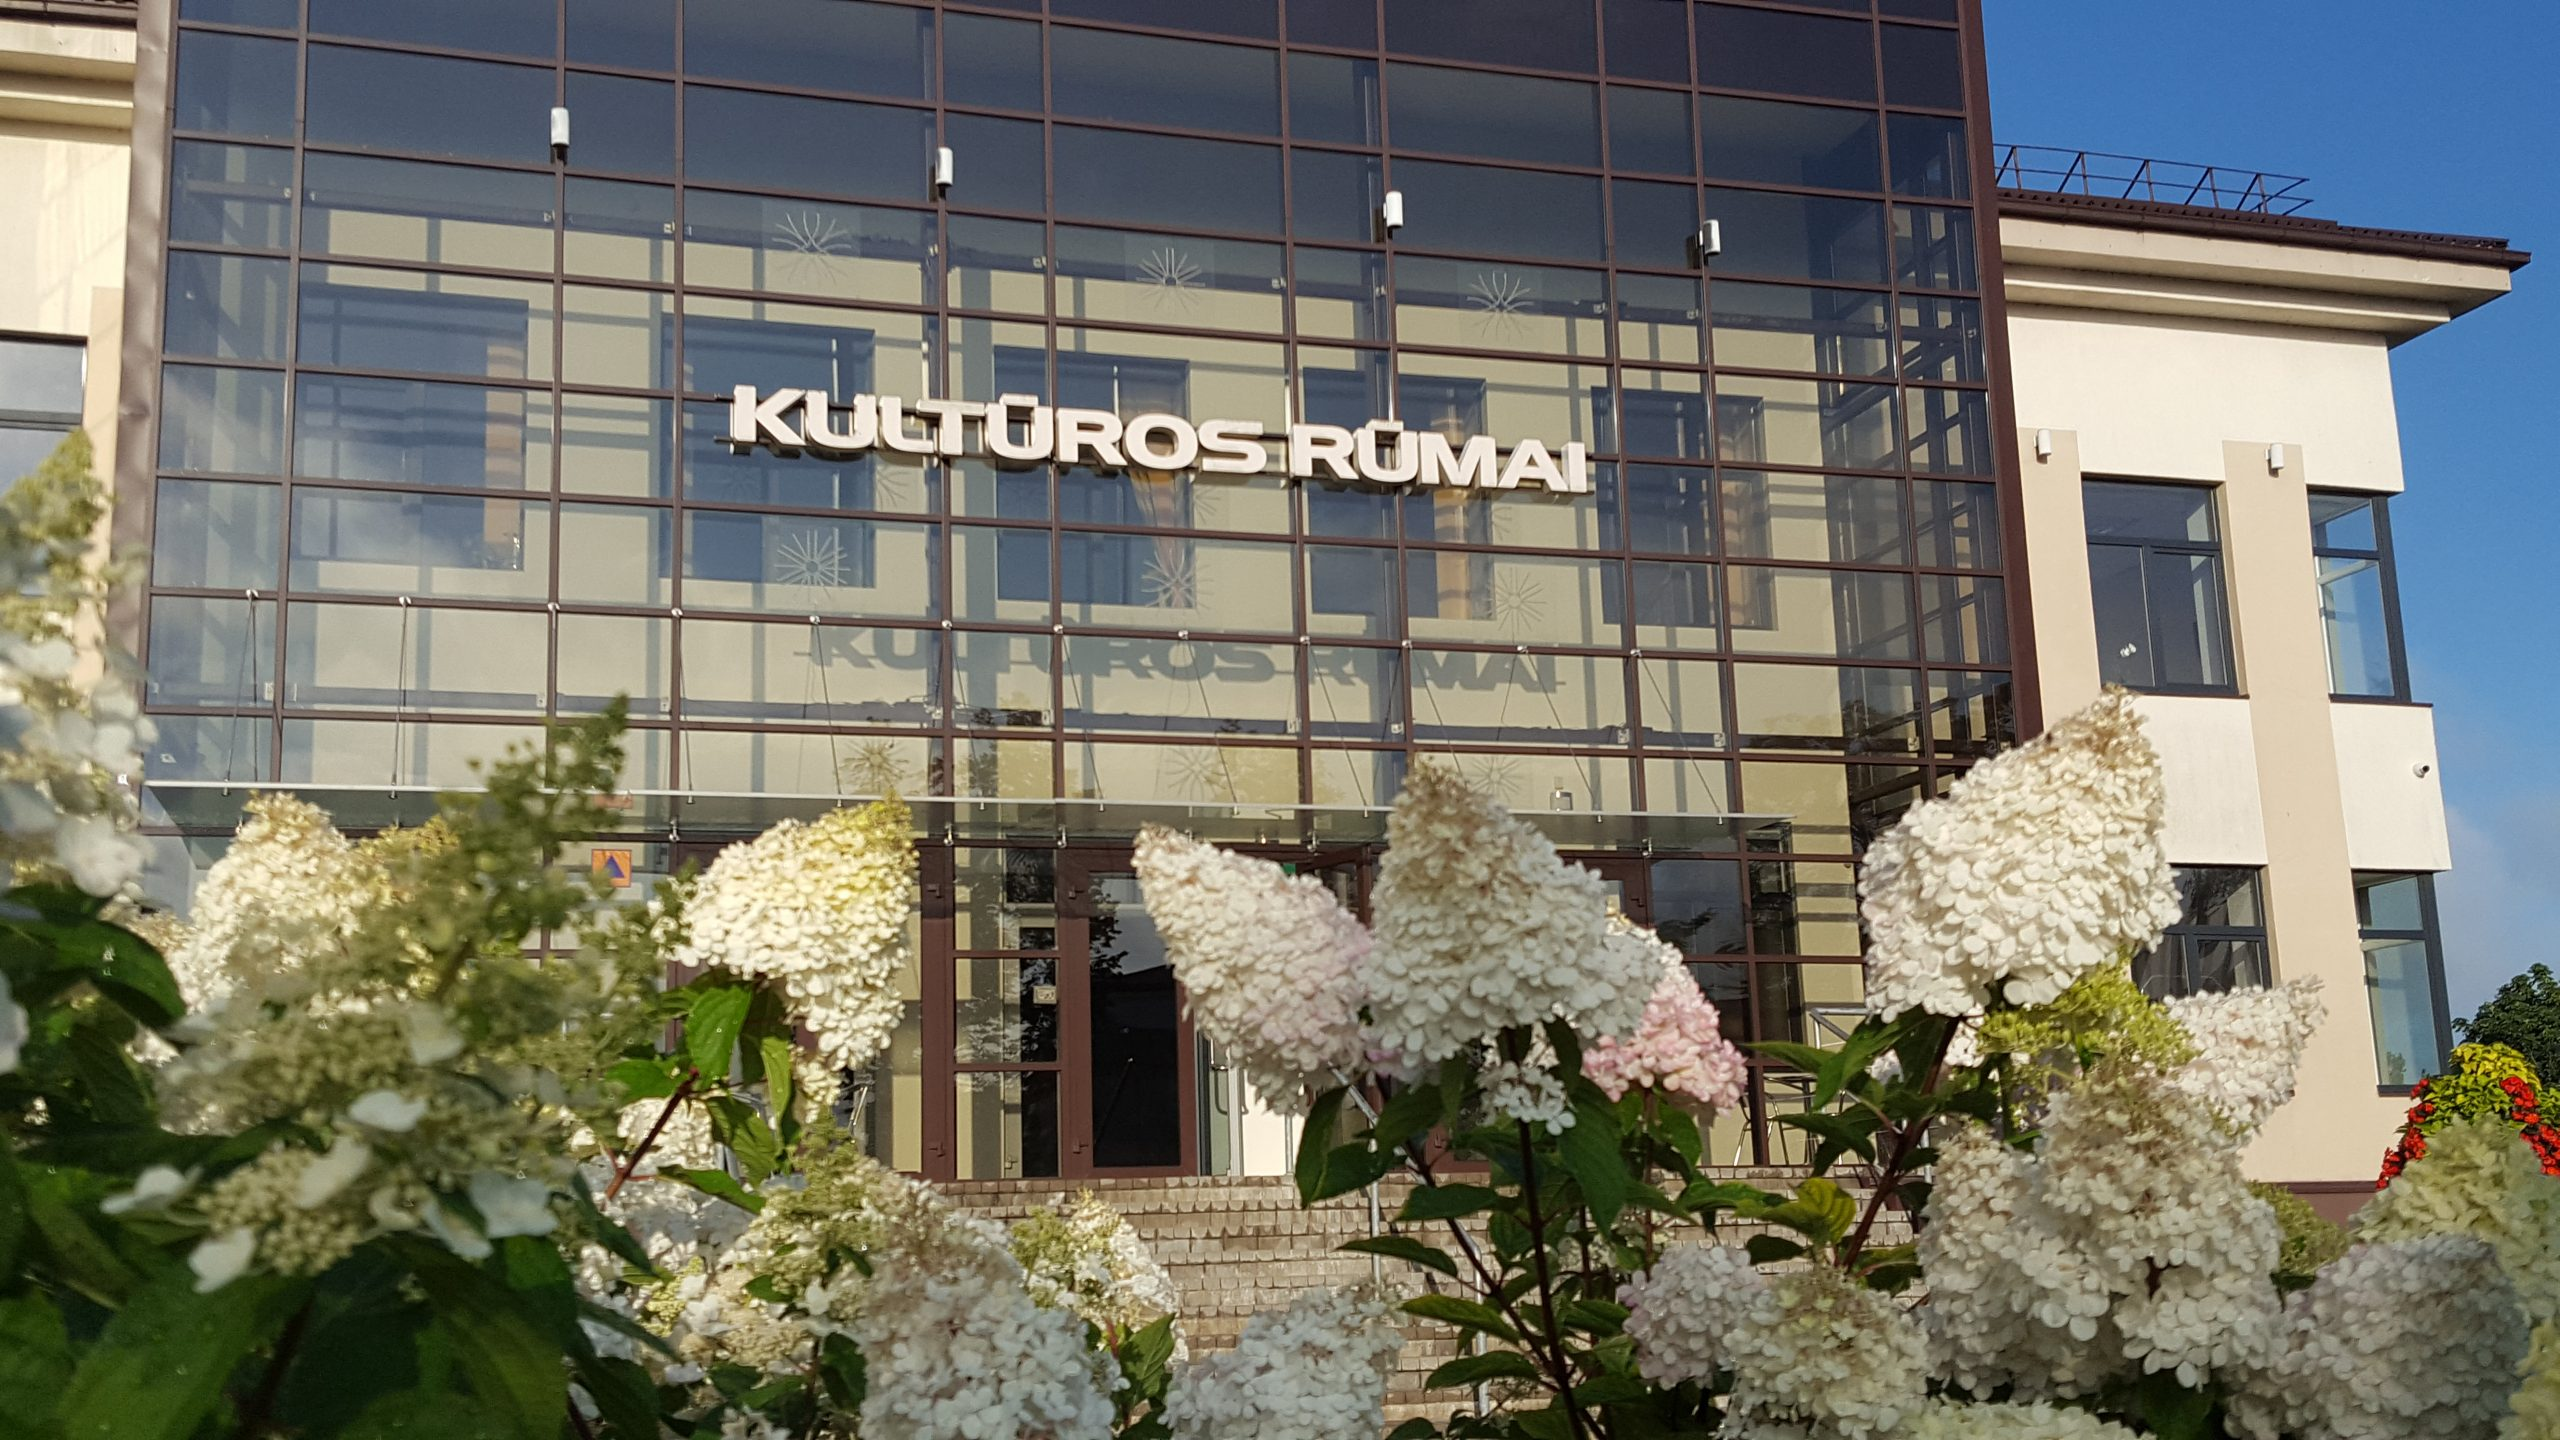 2020-07-29 Tauragės kultūros rūmų erdvės kviečia užsukti